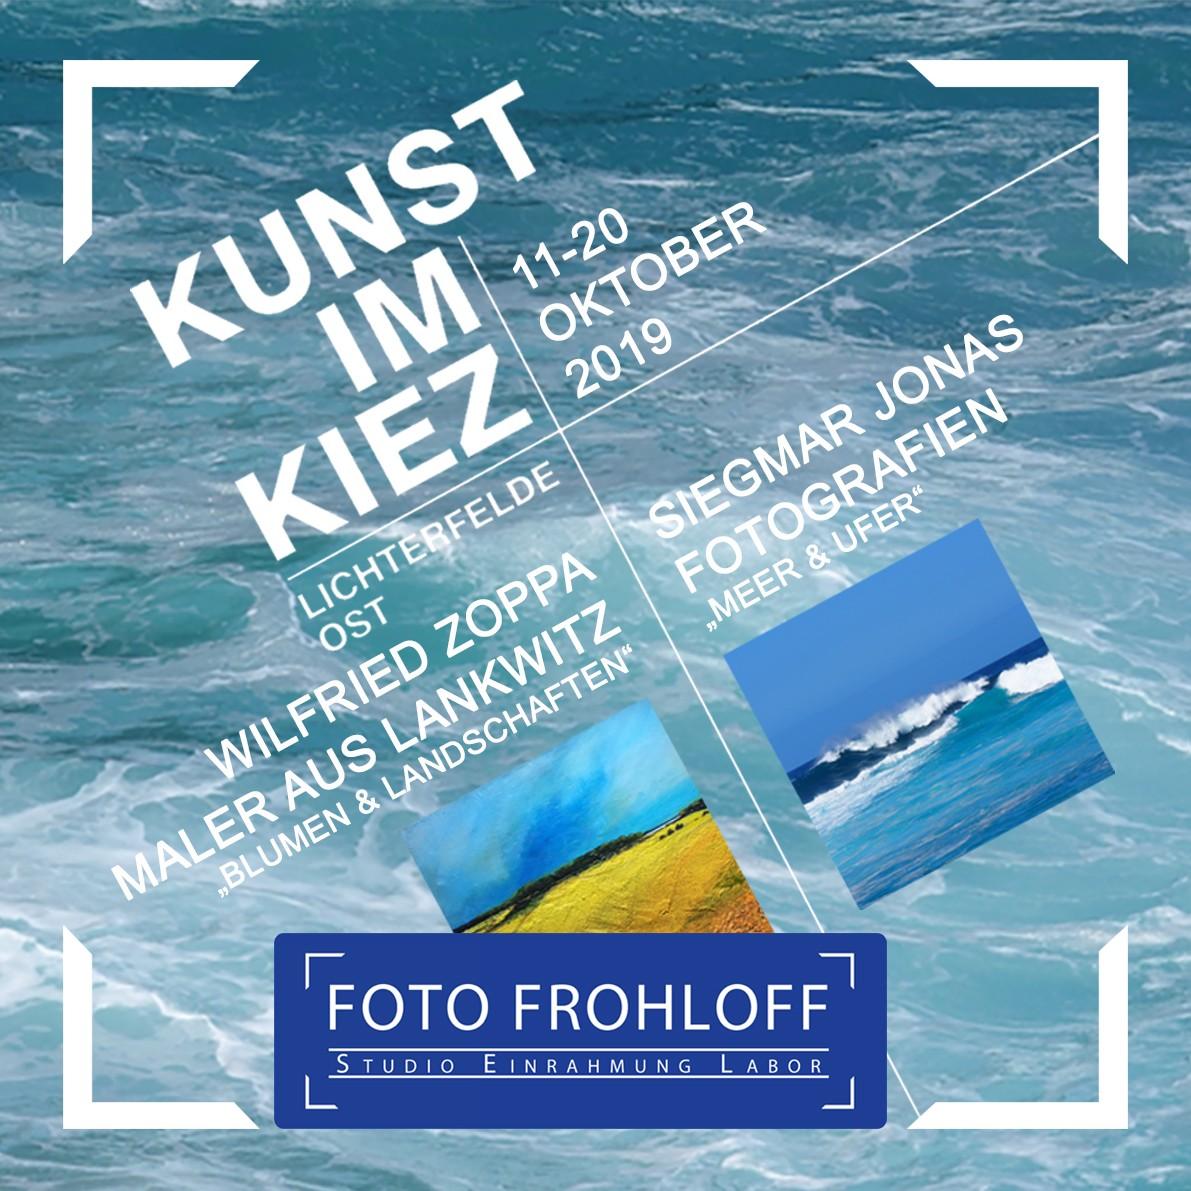 Kunst im Kiez 11- 20 Oktober 2019 - Lichterfelde Ost